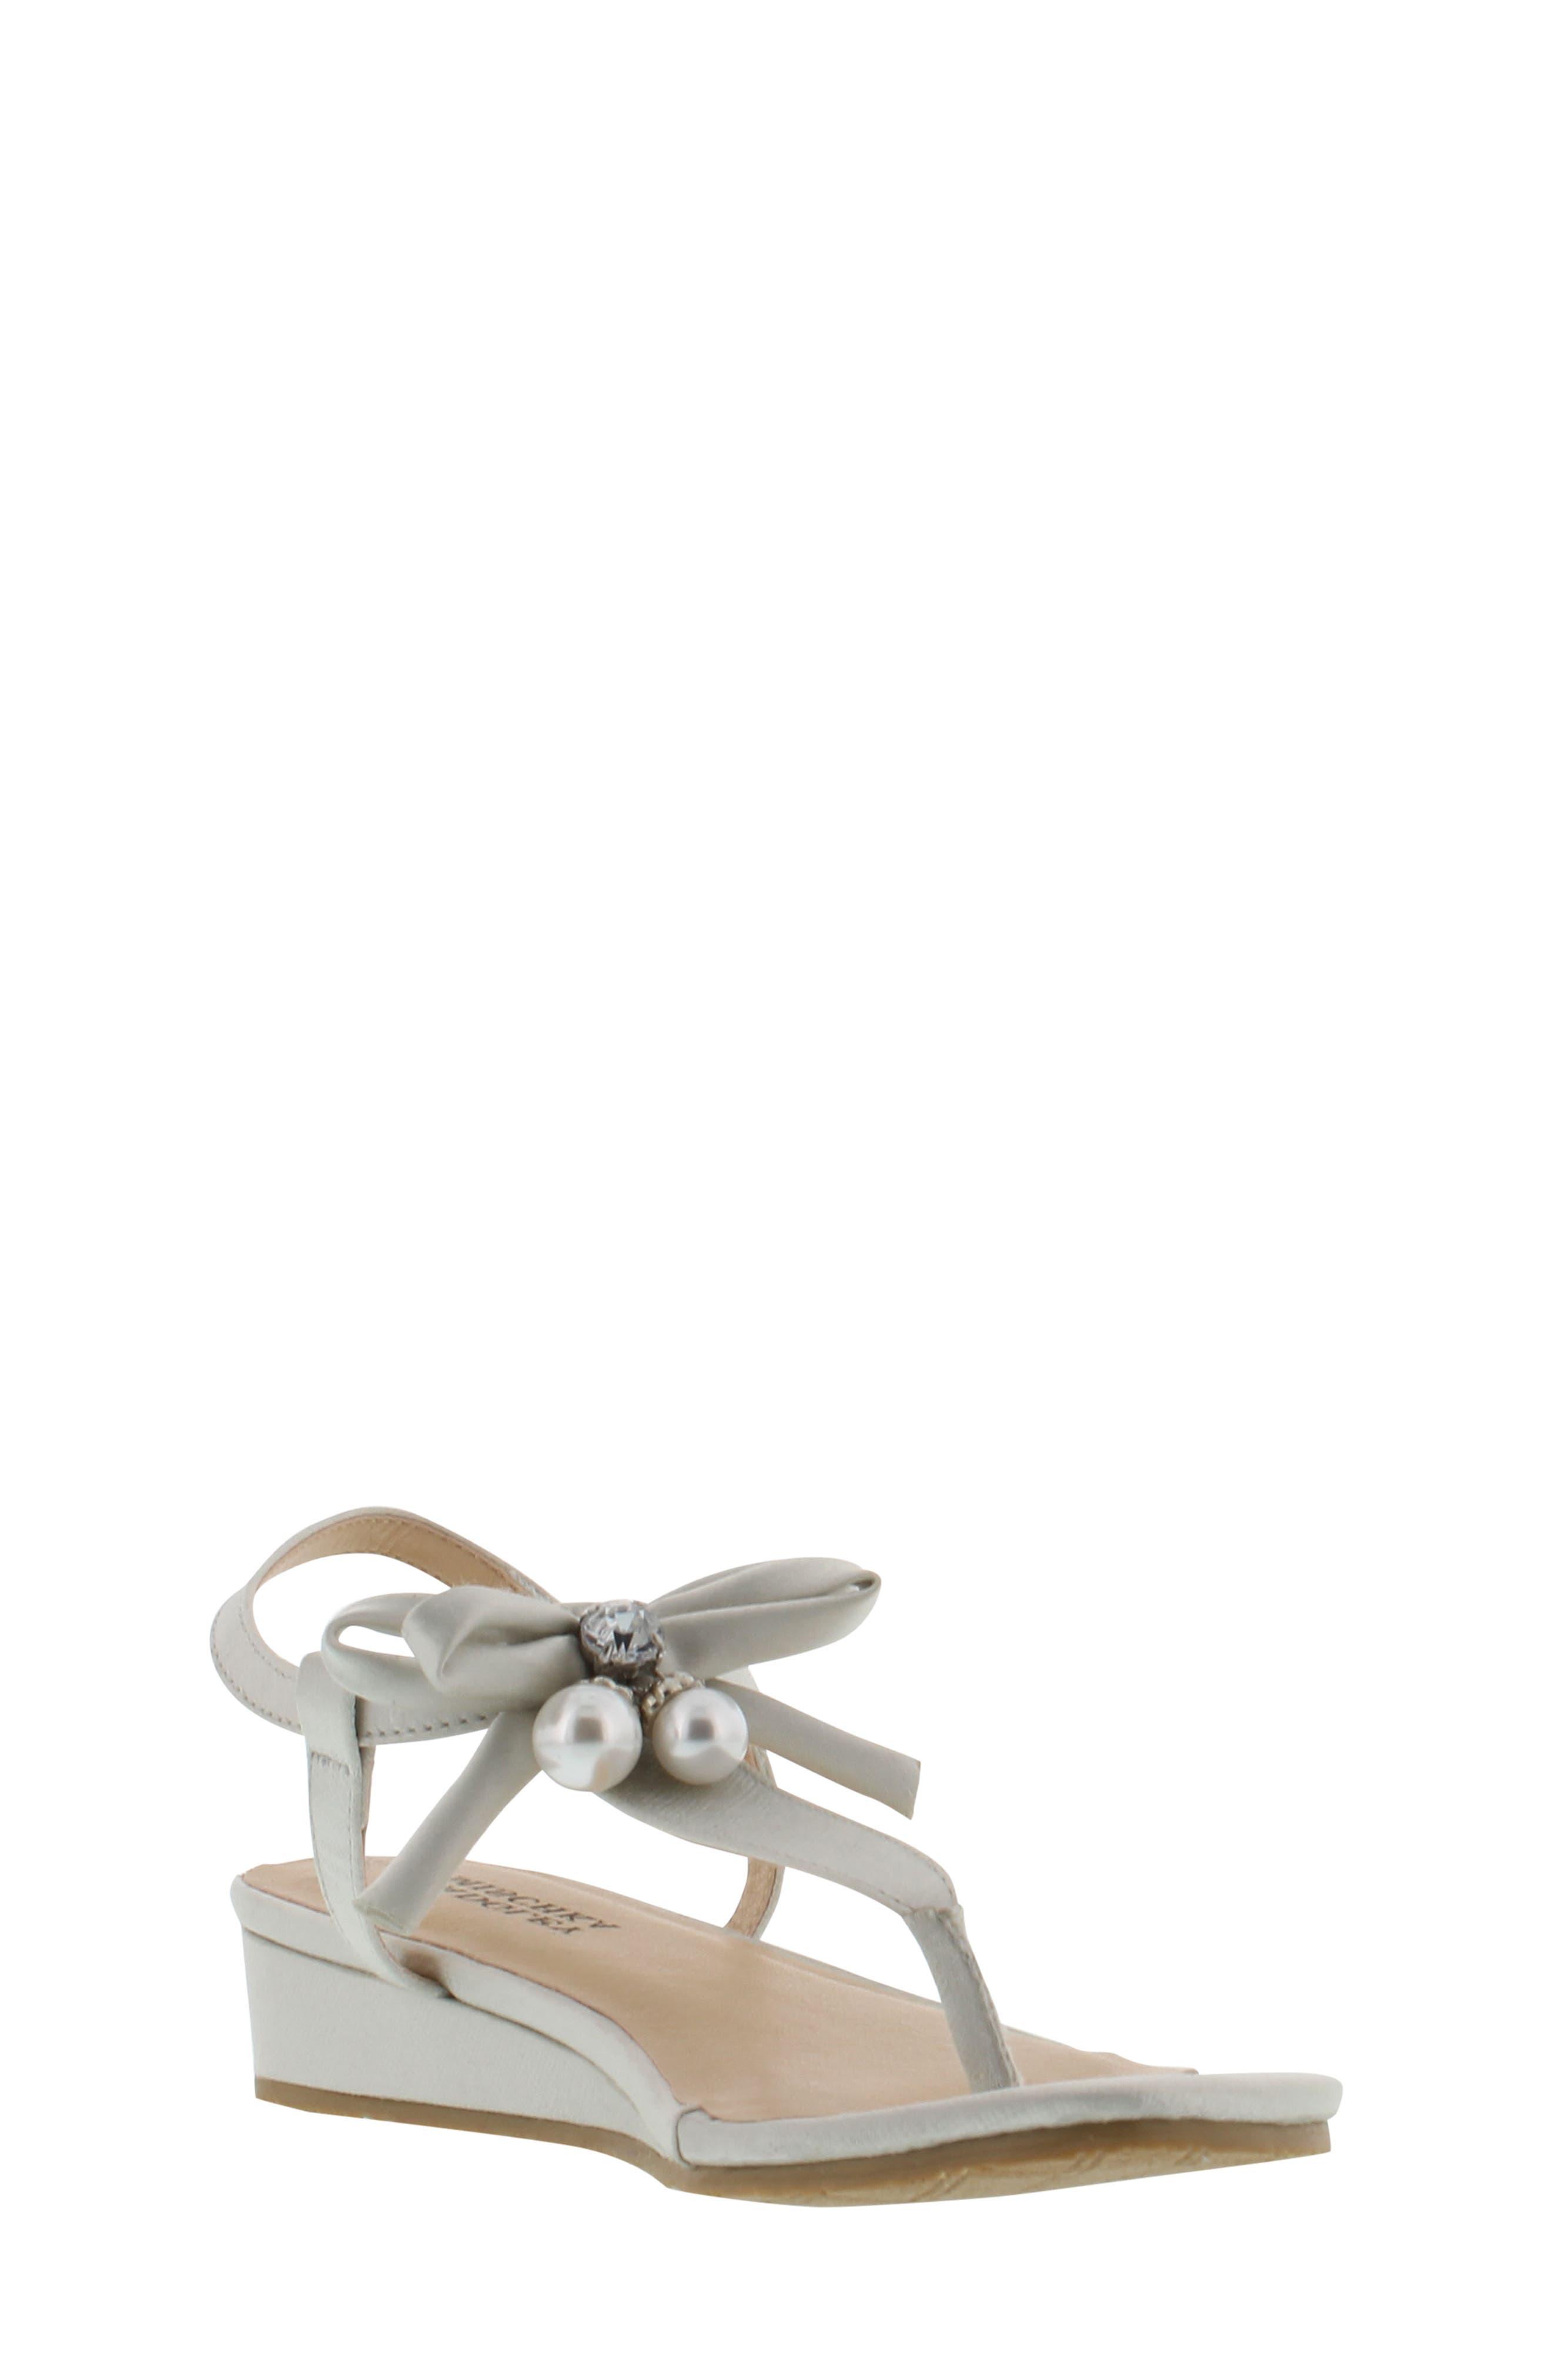 Talia Embellished Bow Sandal,                         Main,                         color, 040